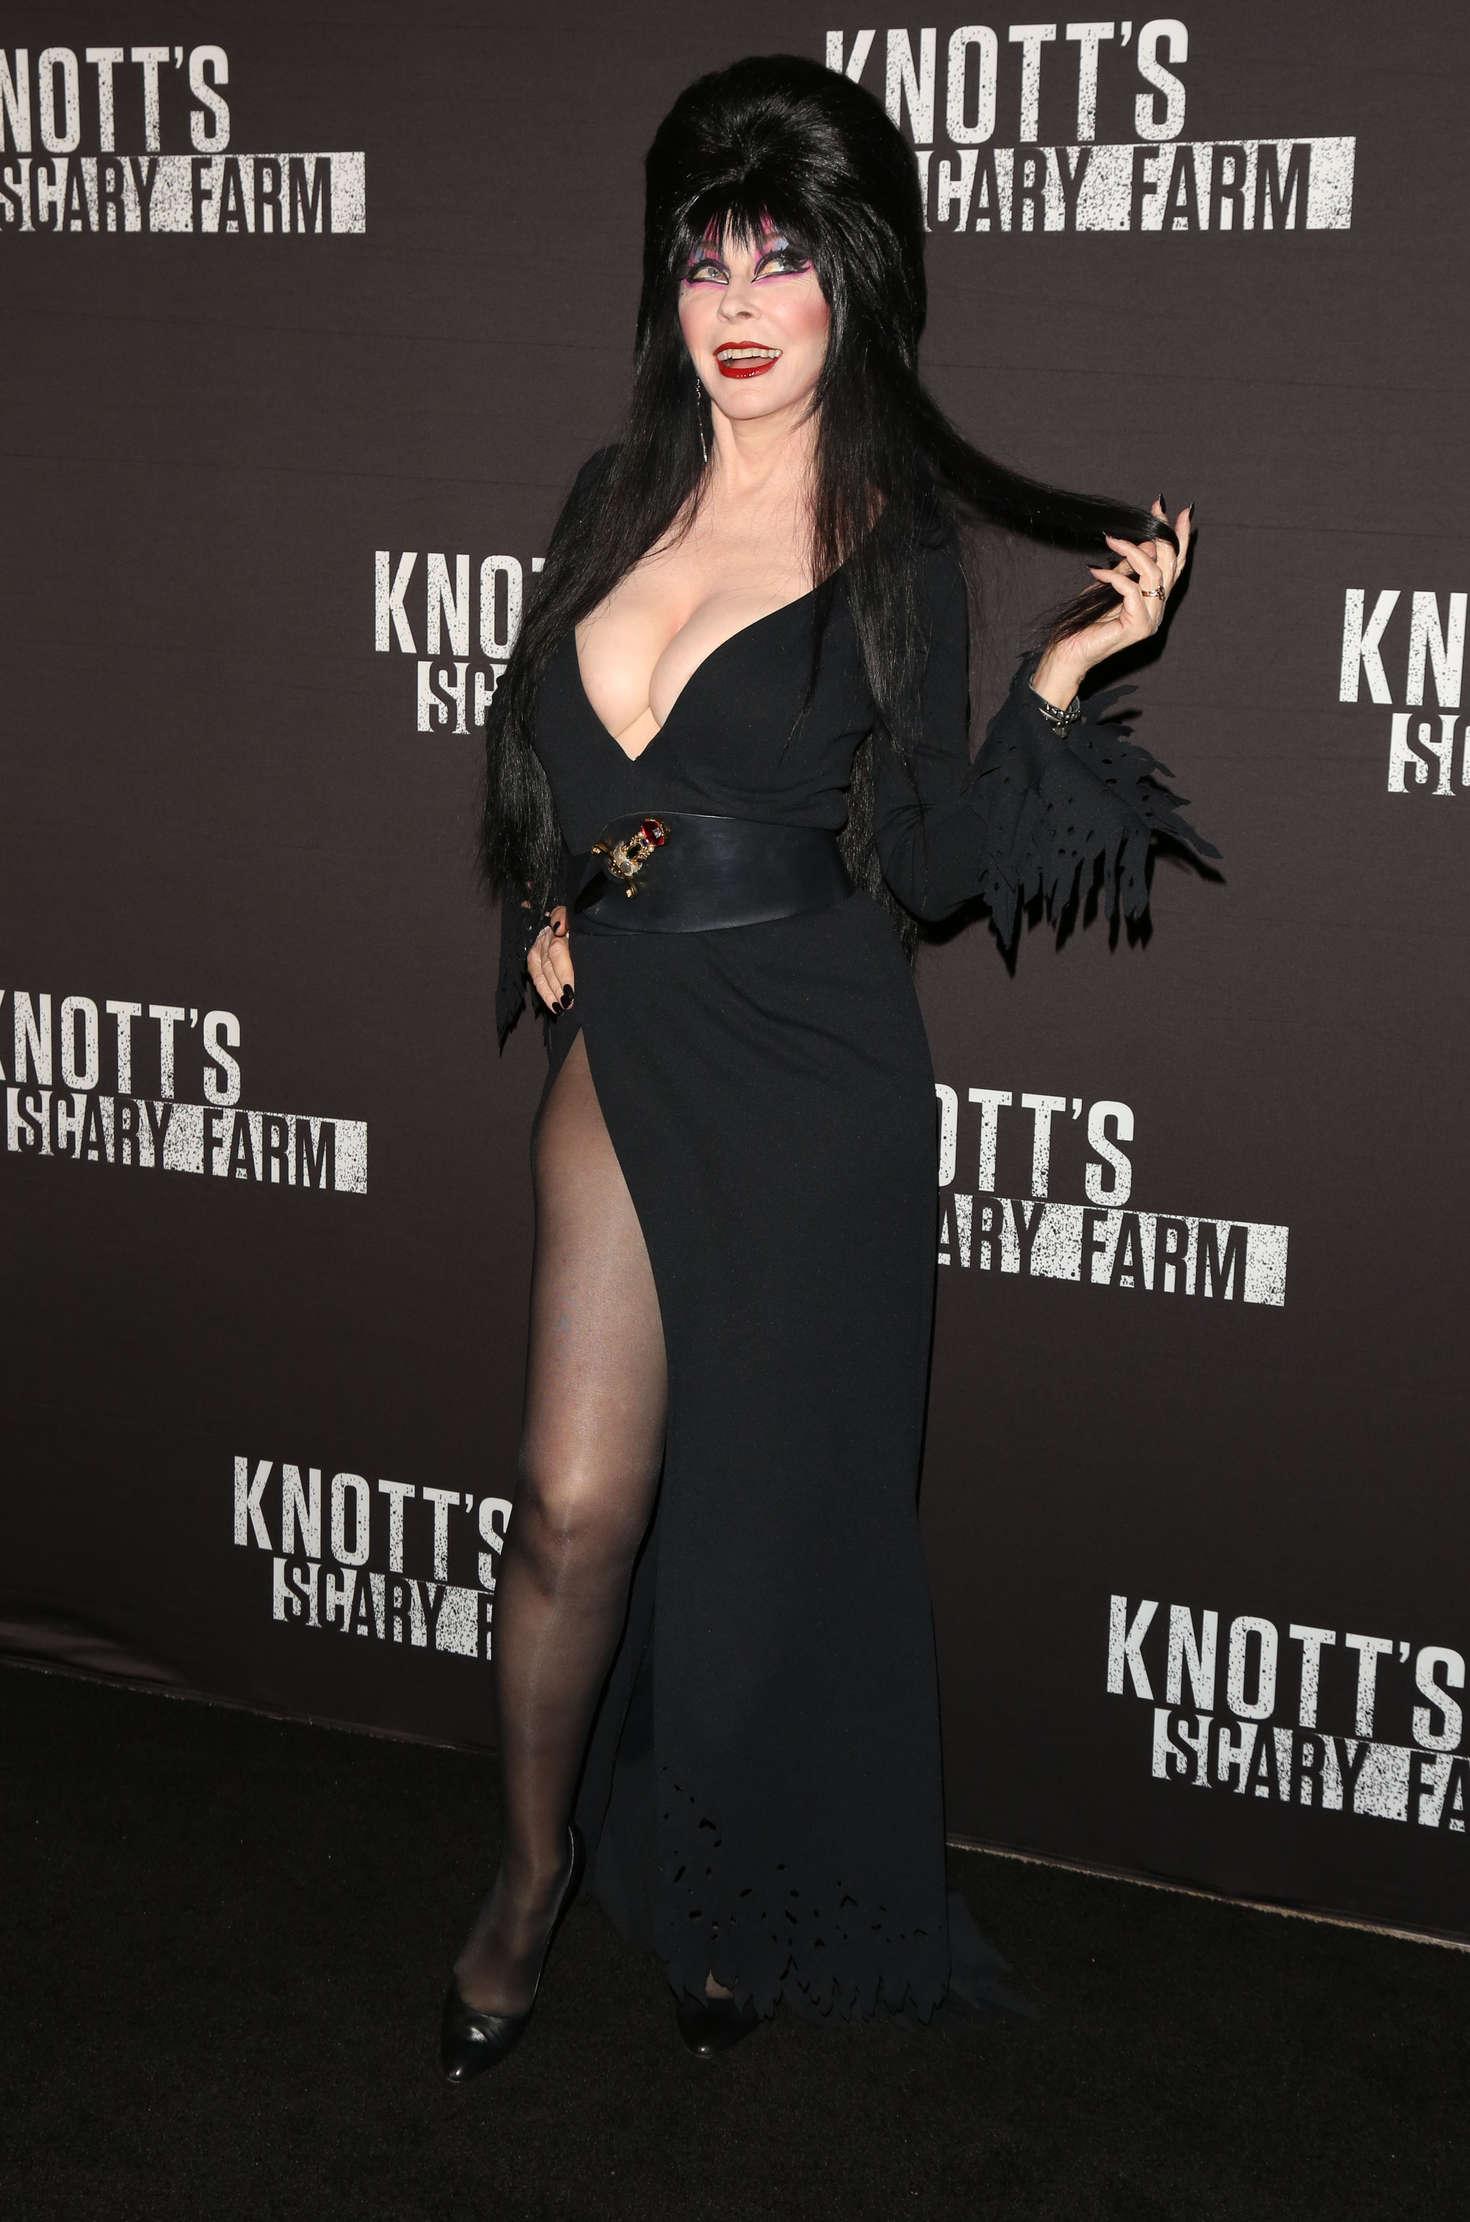 Elvira Knotts Scary Farm Opening Night 08 Gotceleb